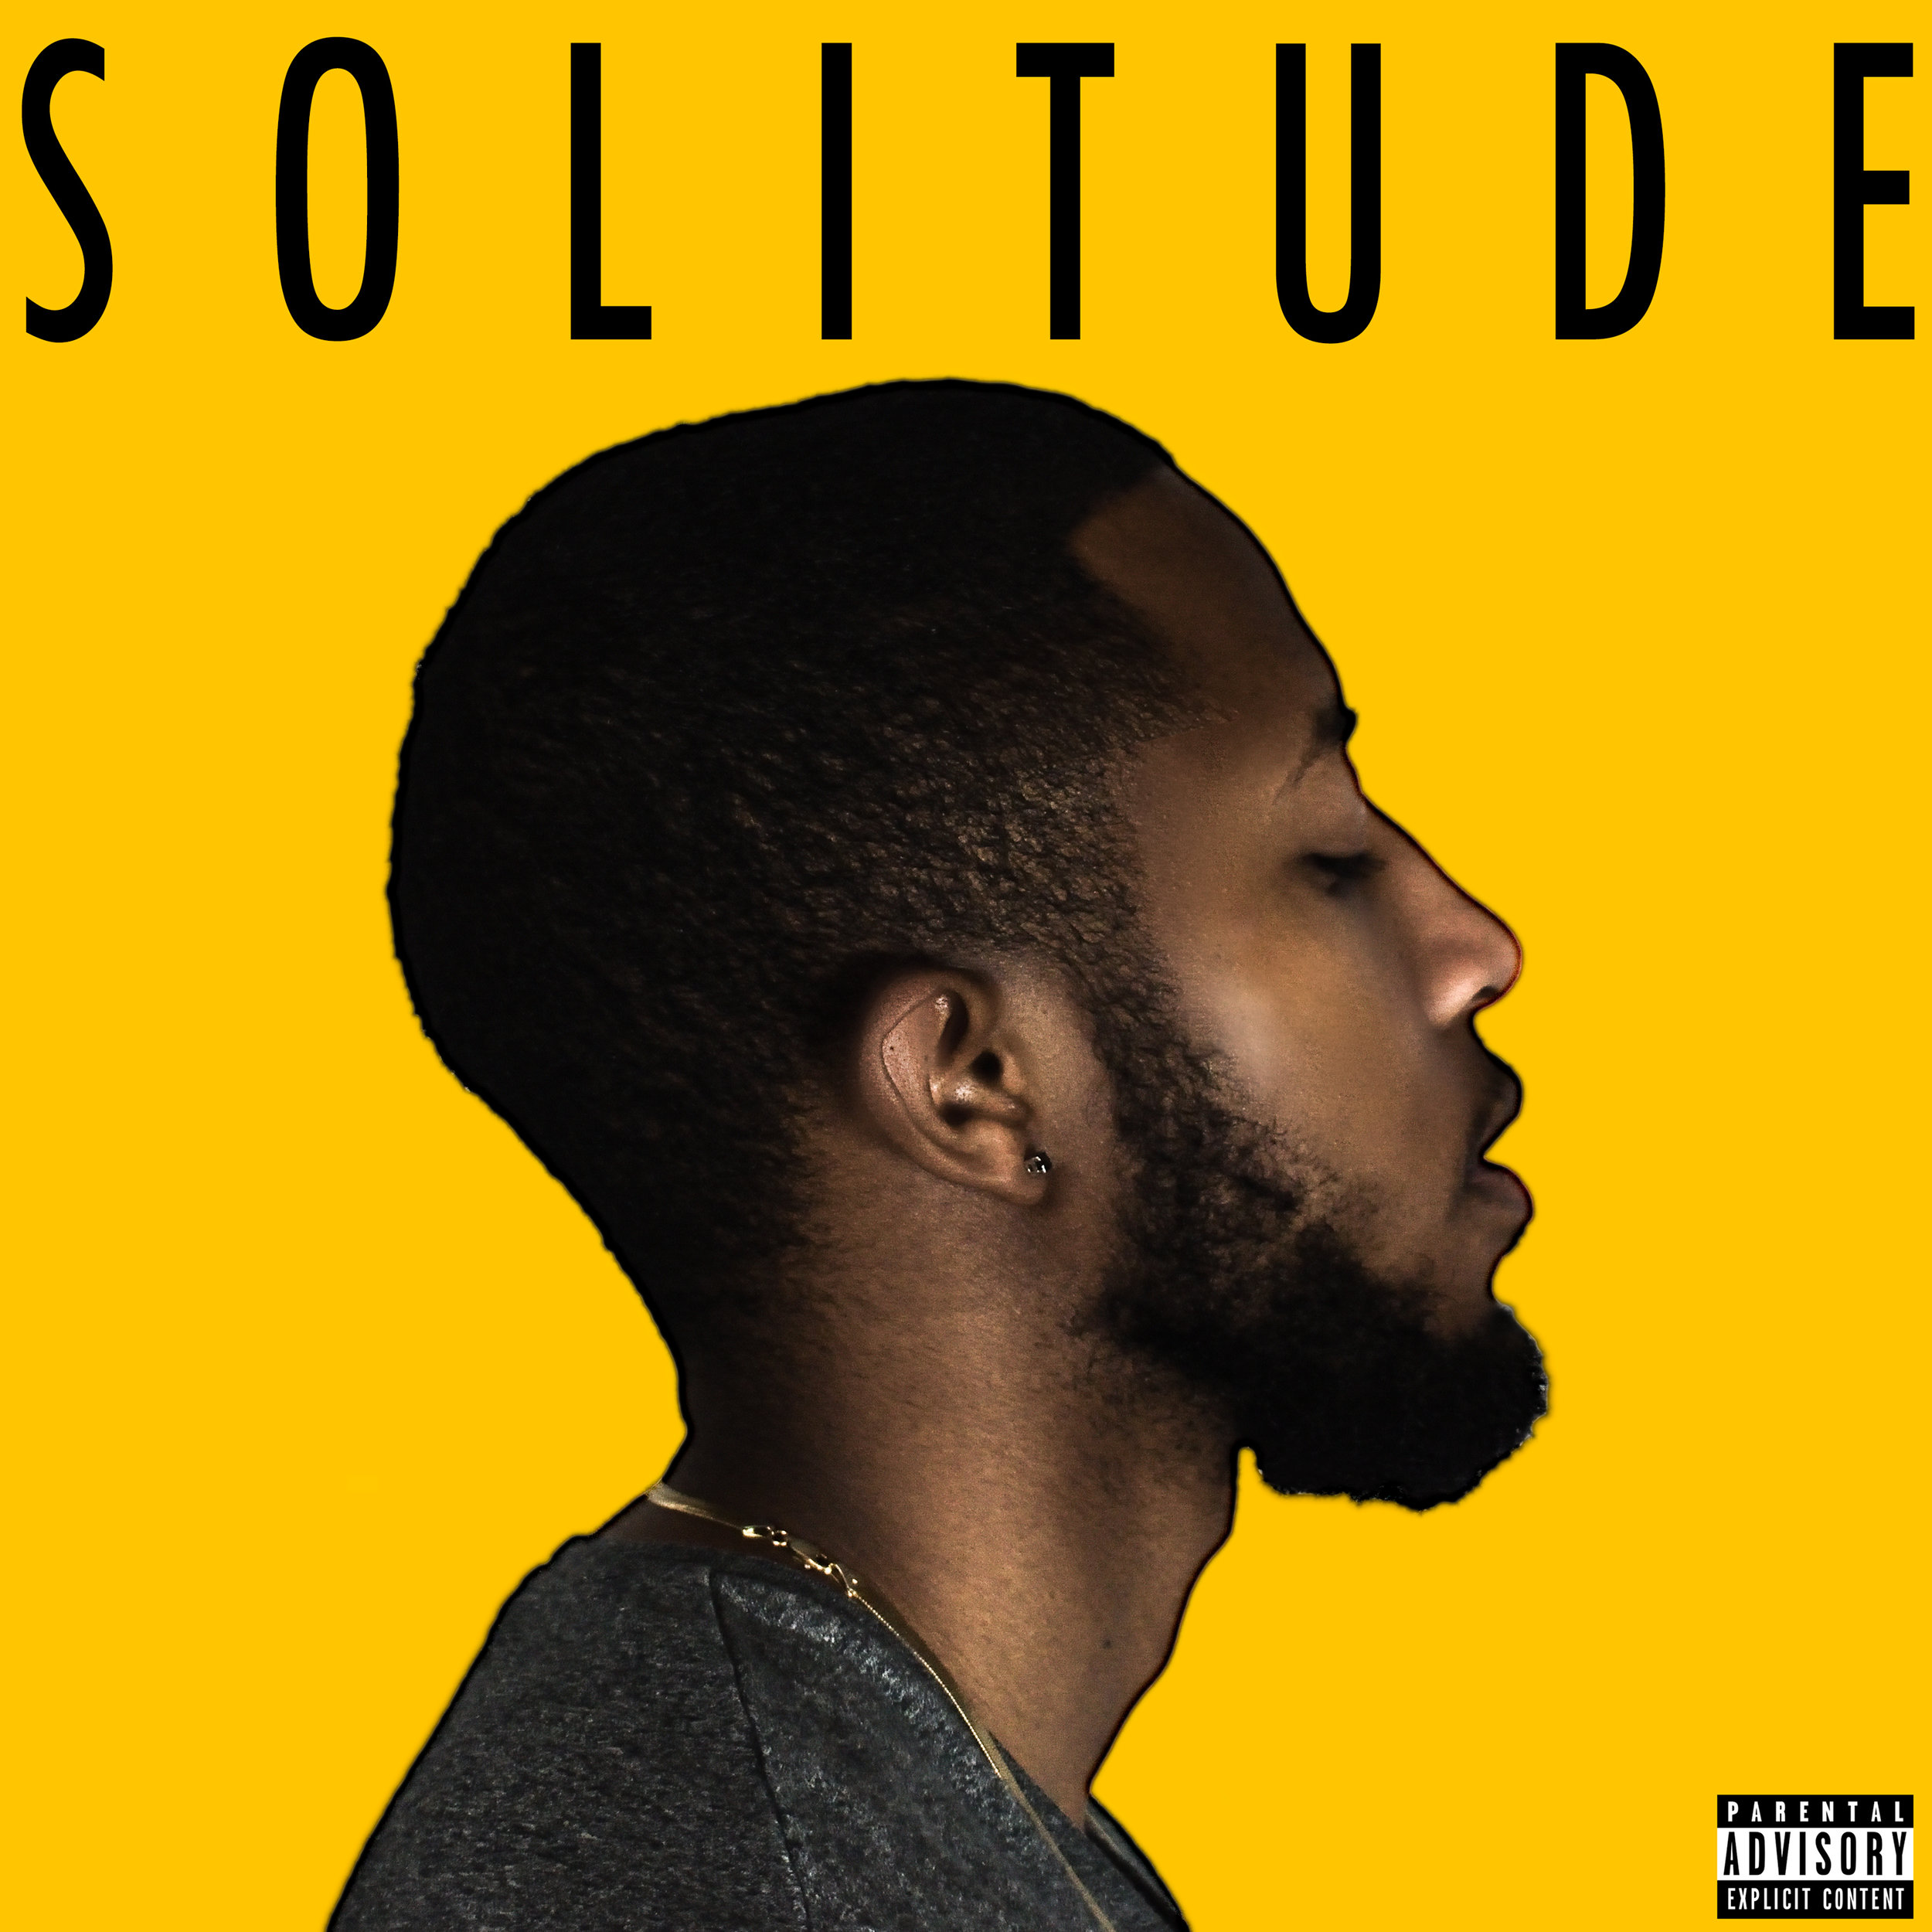 Solitude Final Cover.jpg